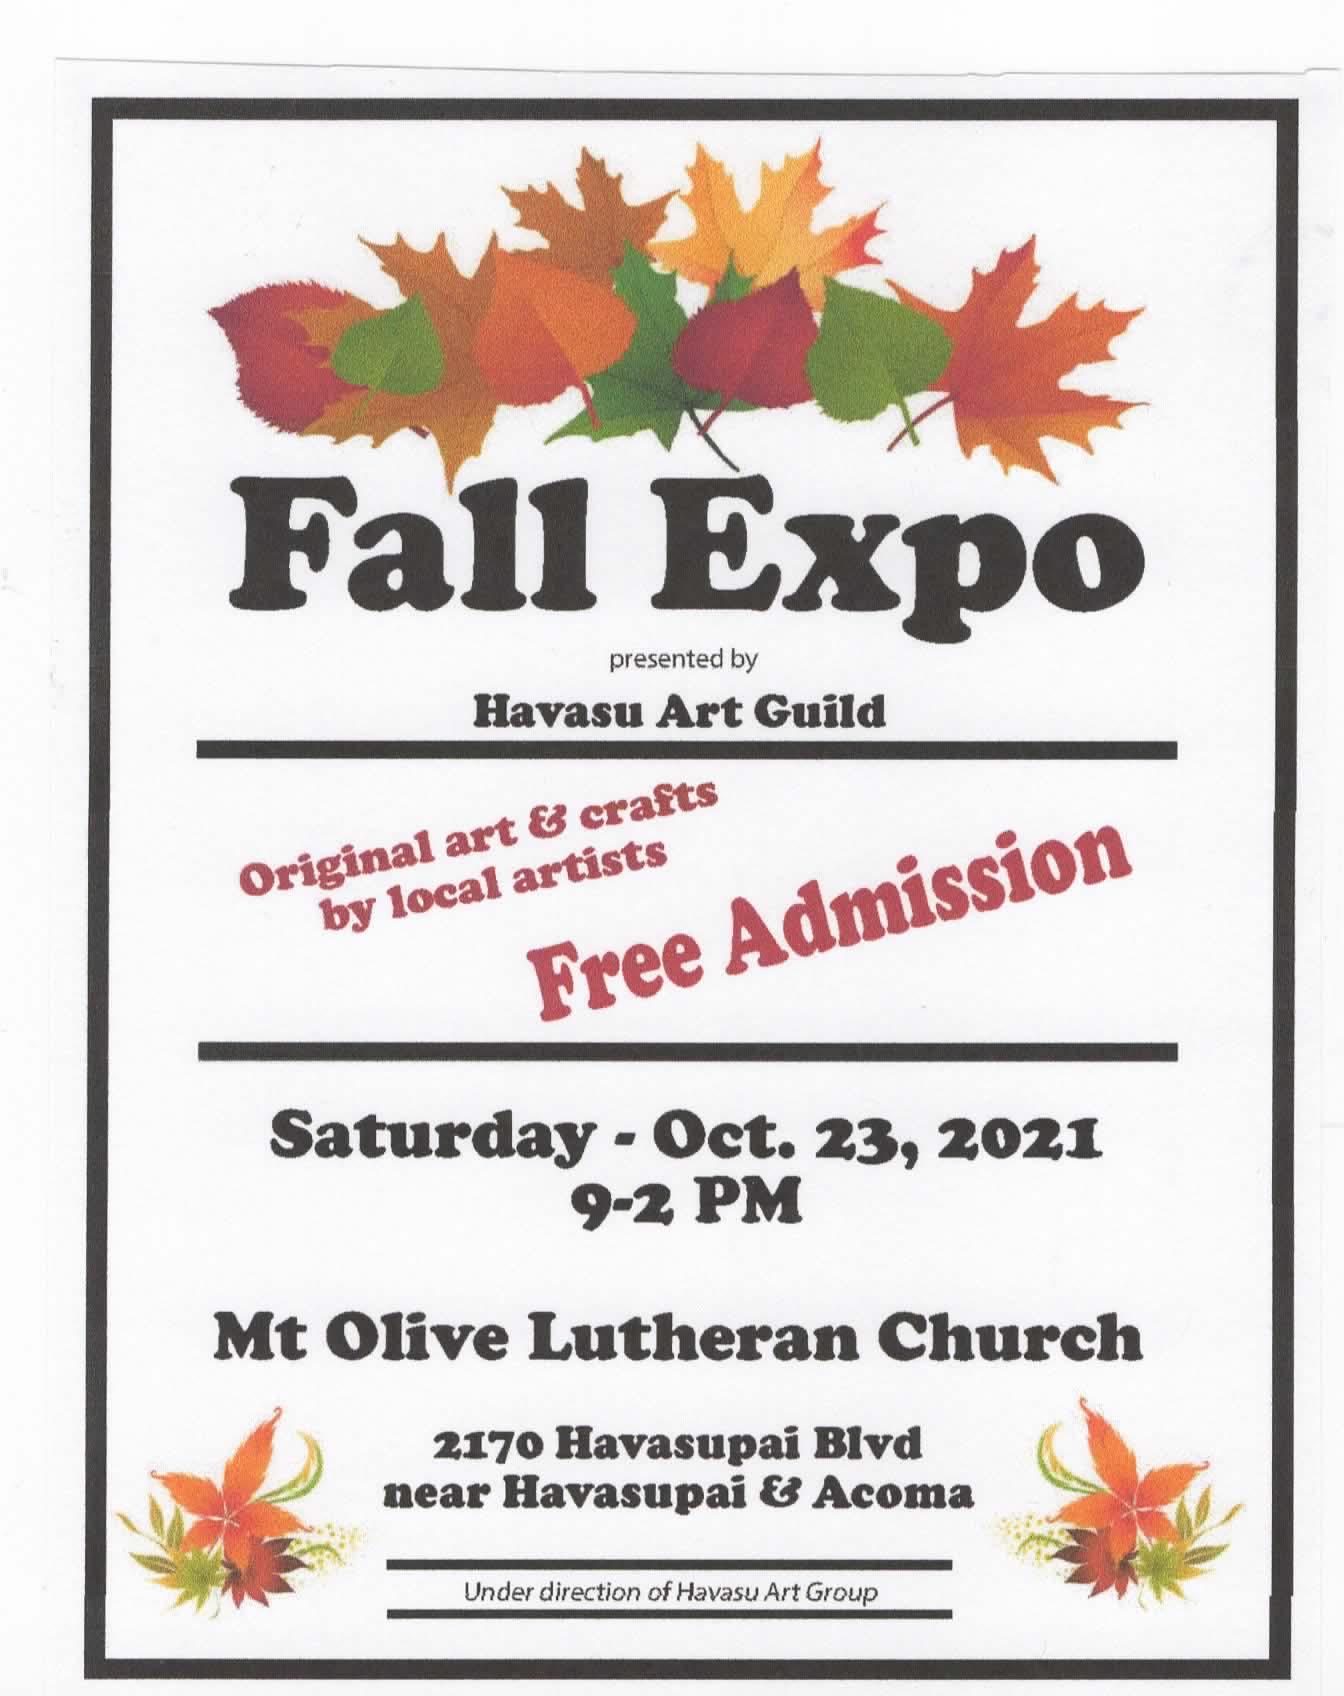 Havasu Art Guild Fall Expo